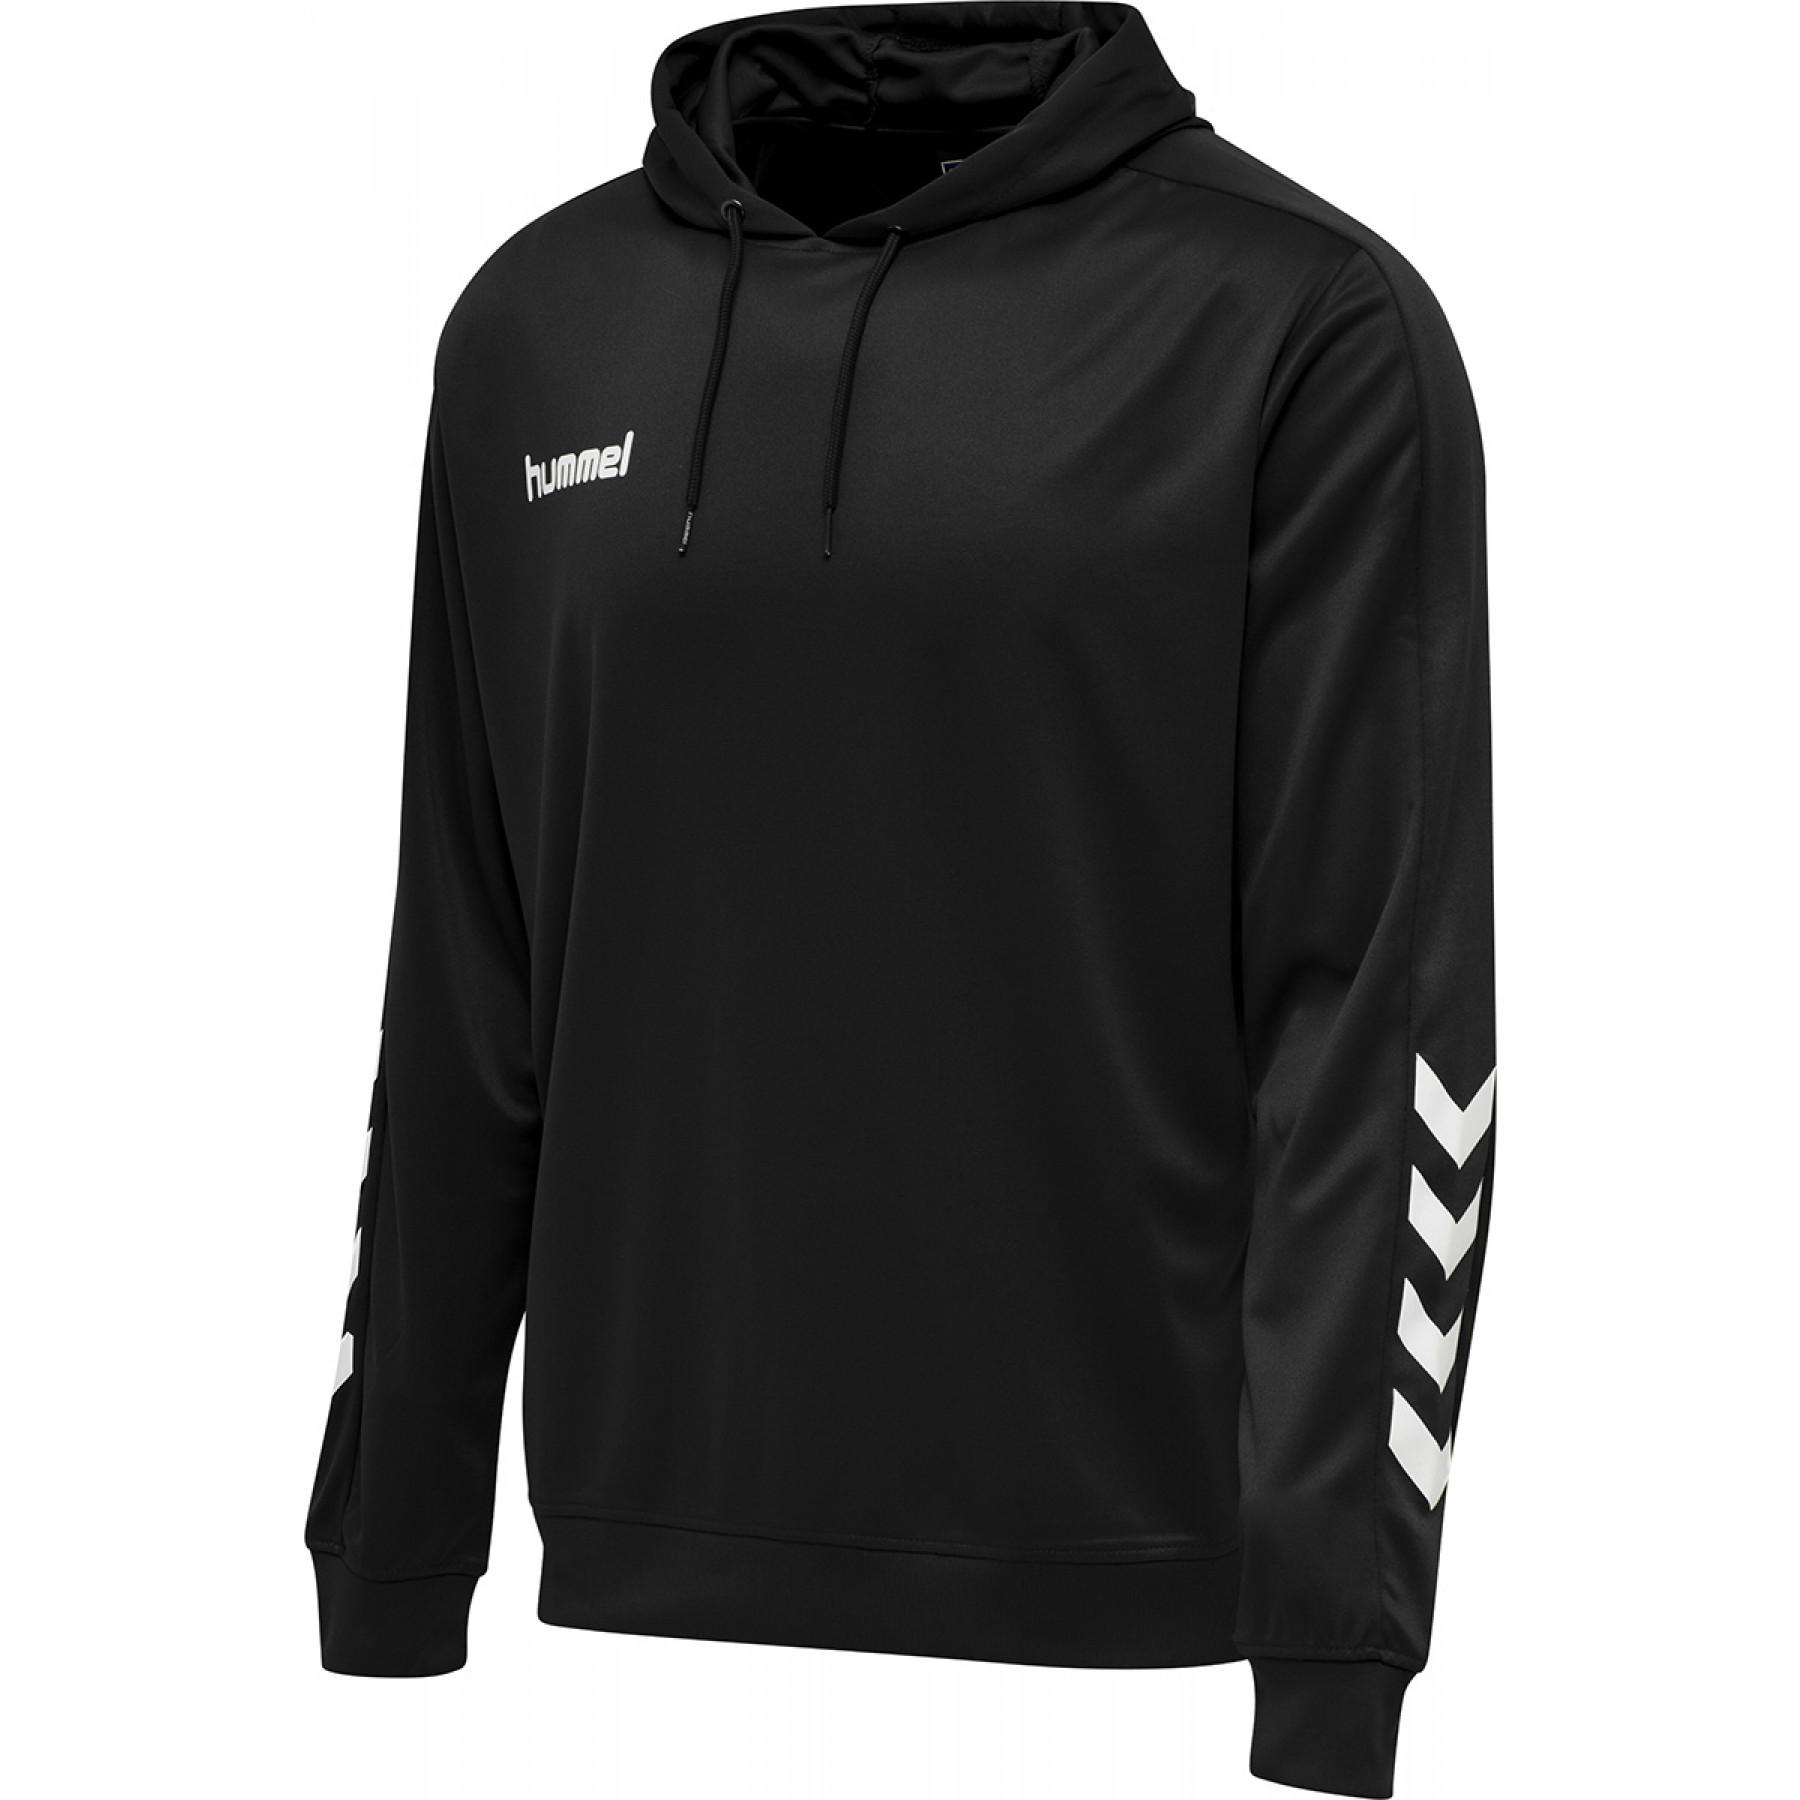 Hooded sweatshirt Hummel hmlPROMO Poly